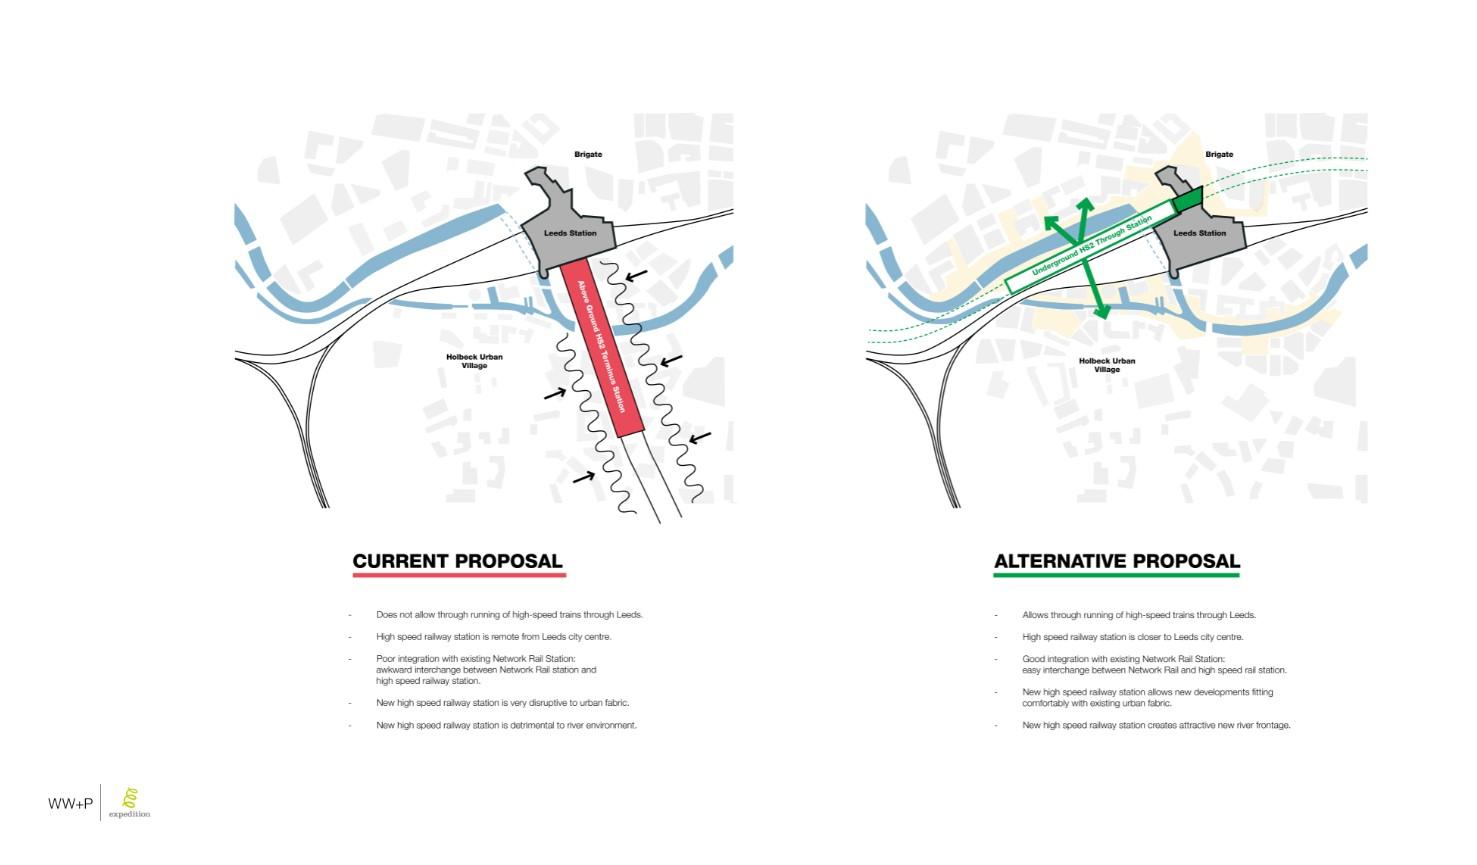 Image-7-Proposed-Leeds-TBR-and-HS2-Station-Comparison-Diagram1.jpg